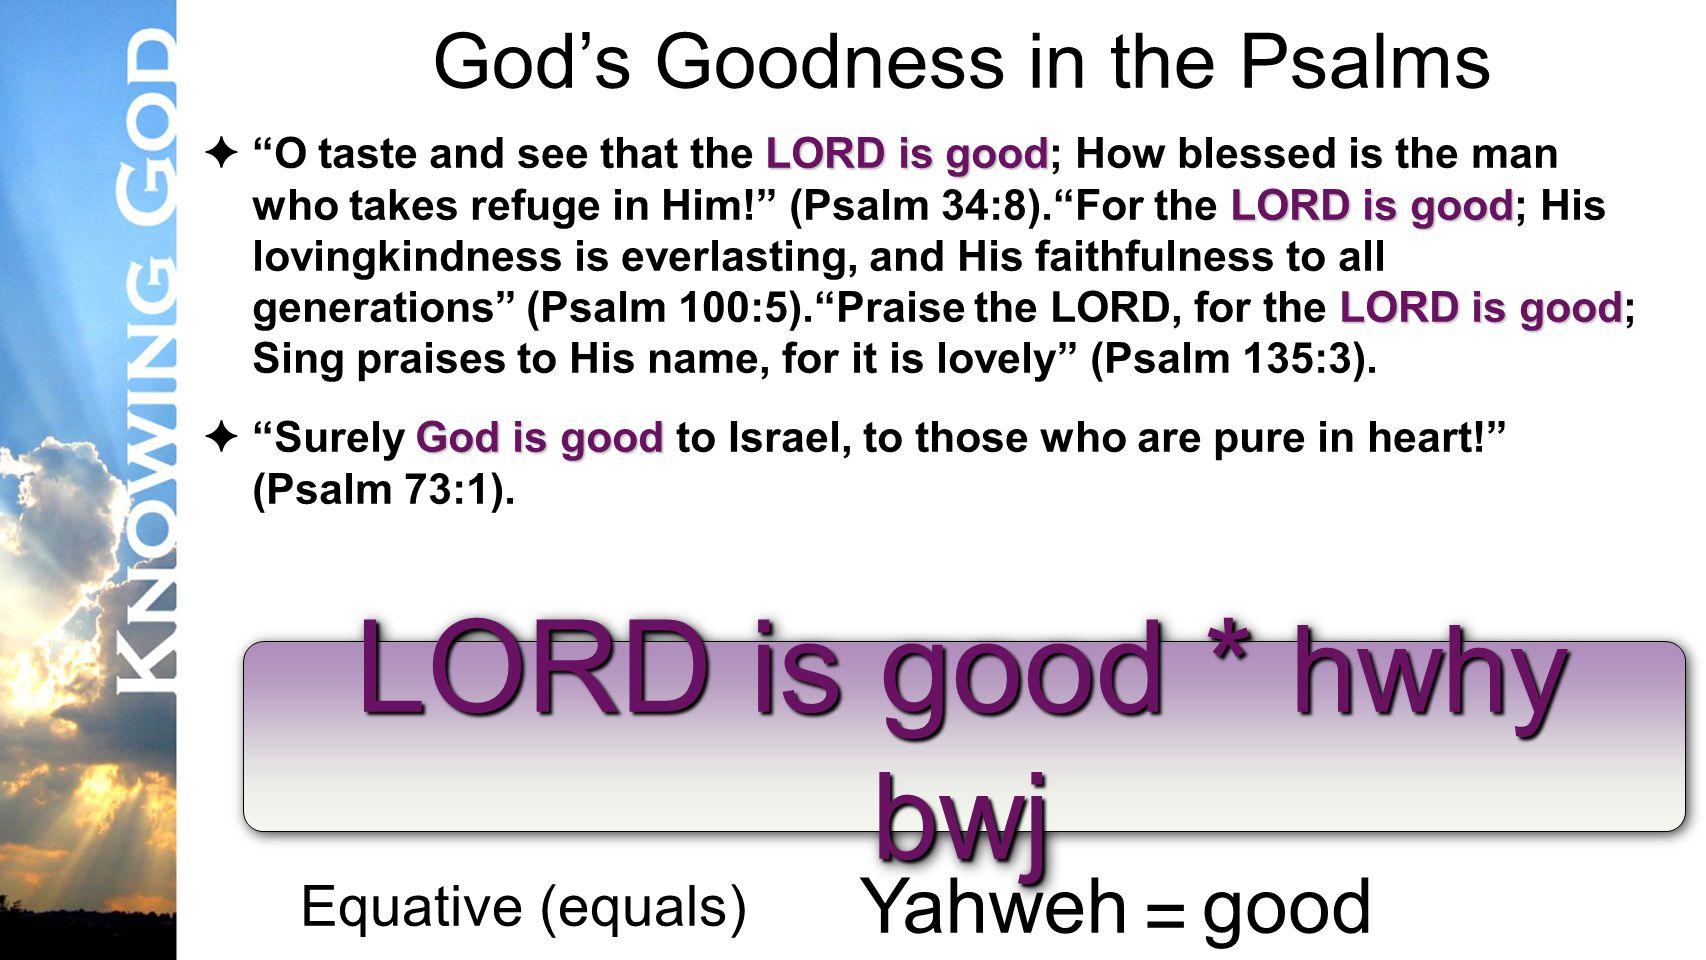 15th psalm